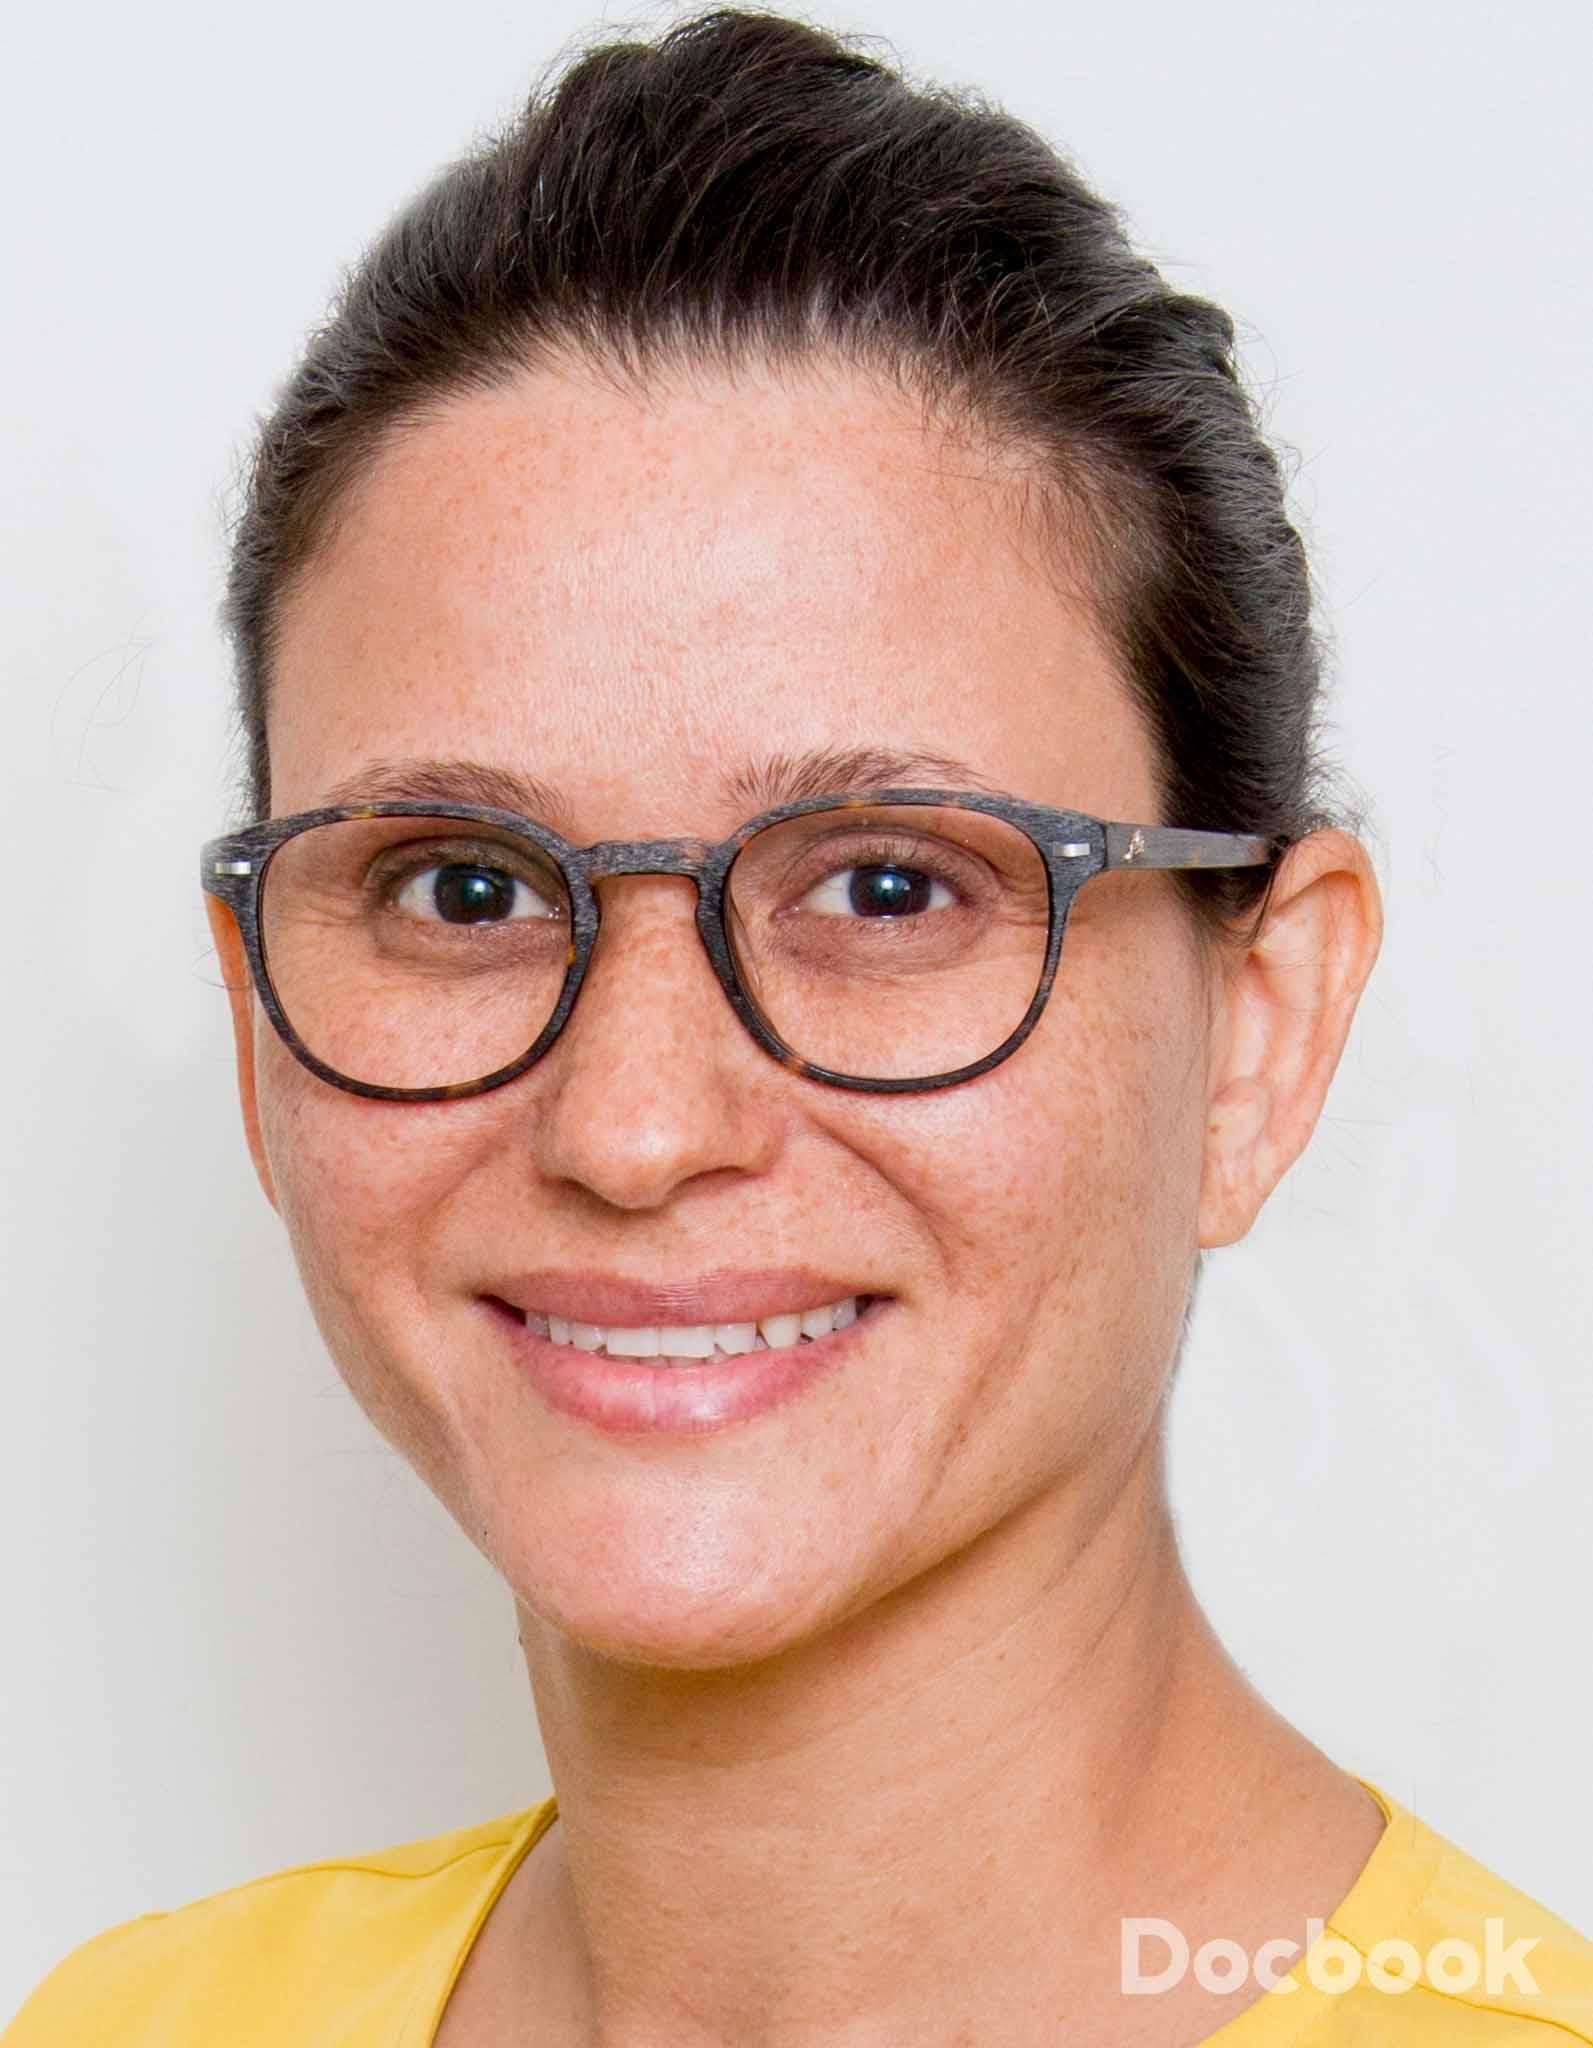 Dr. Saba Karkhi